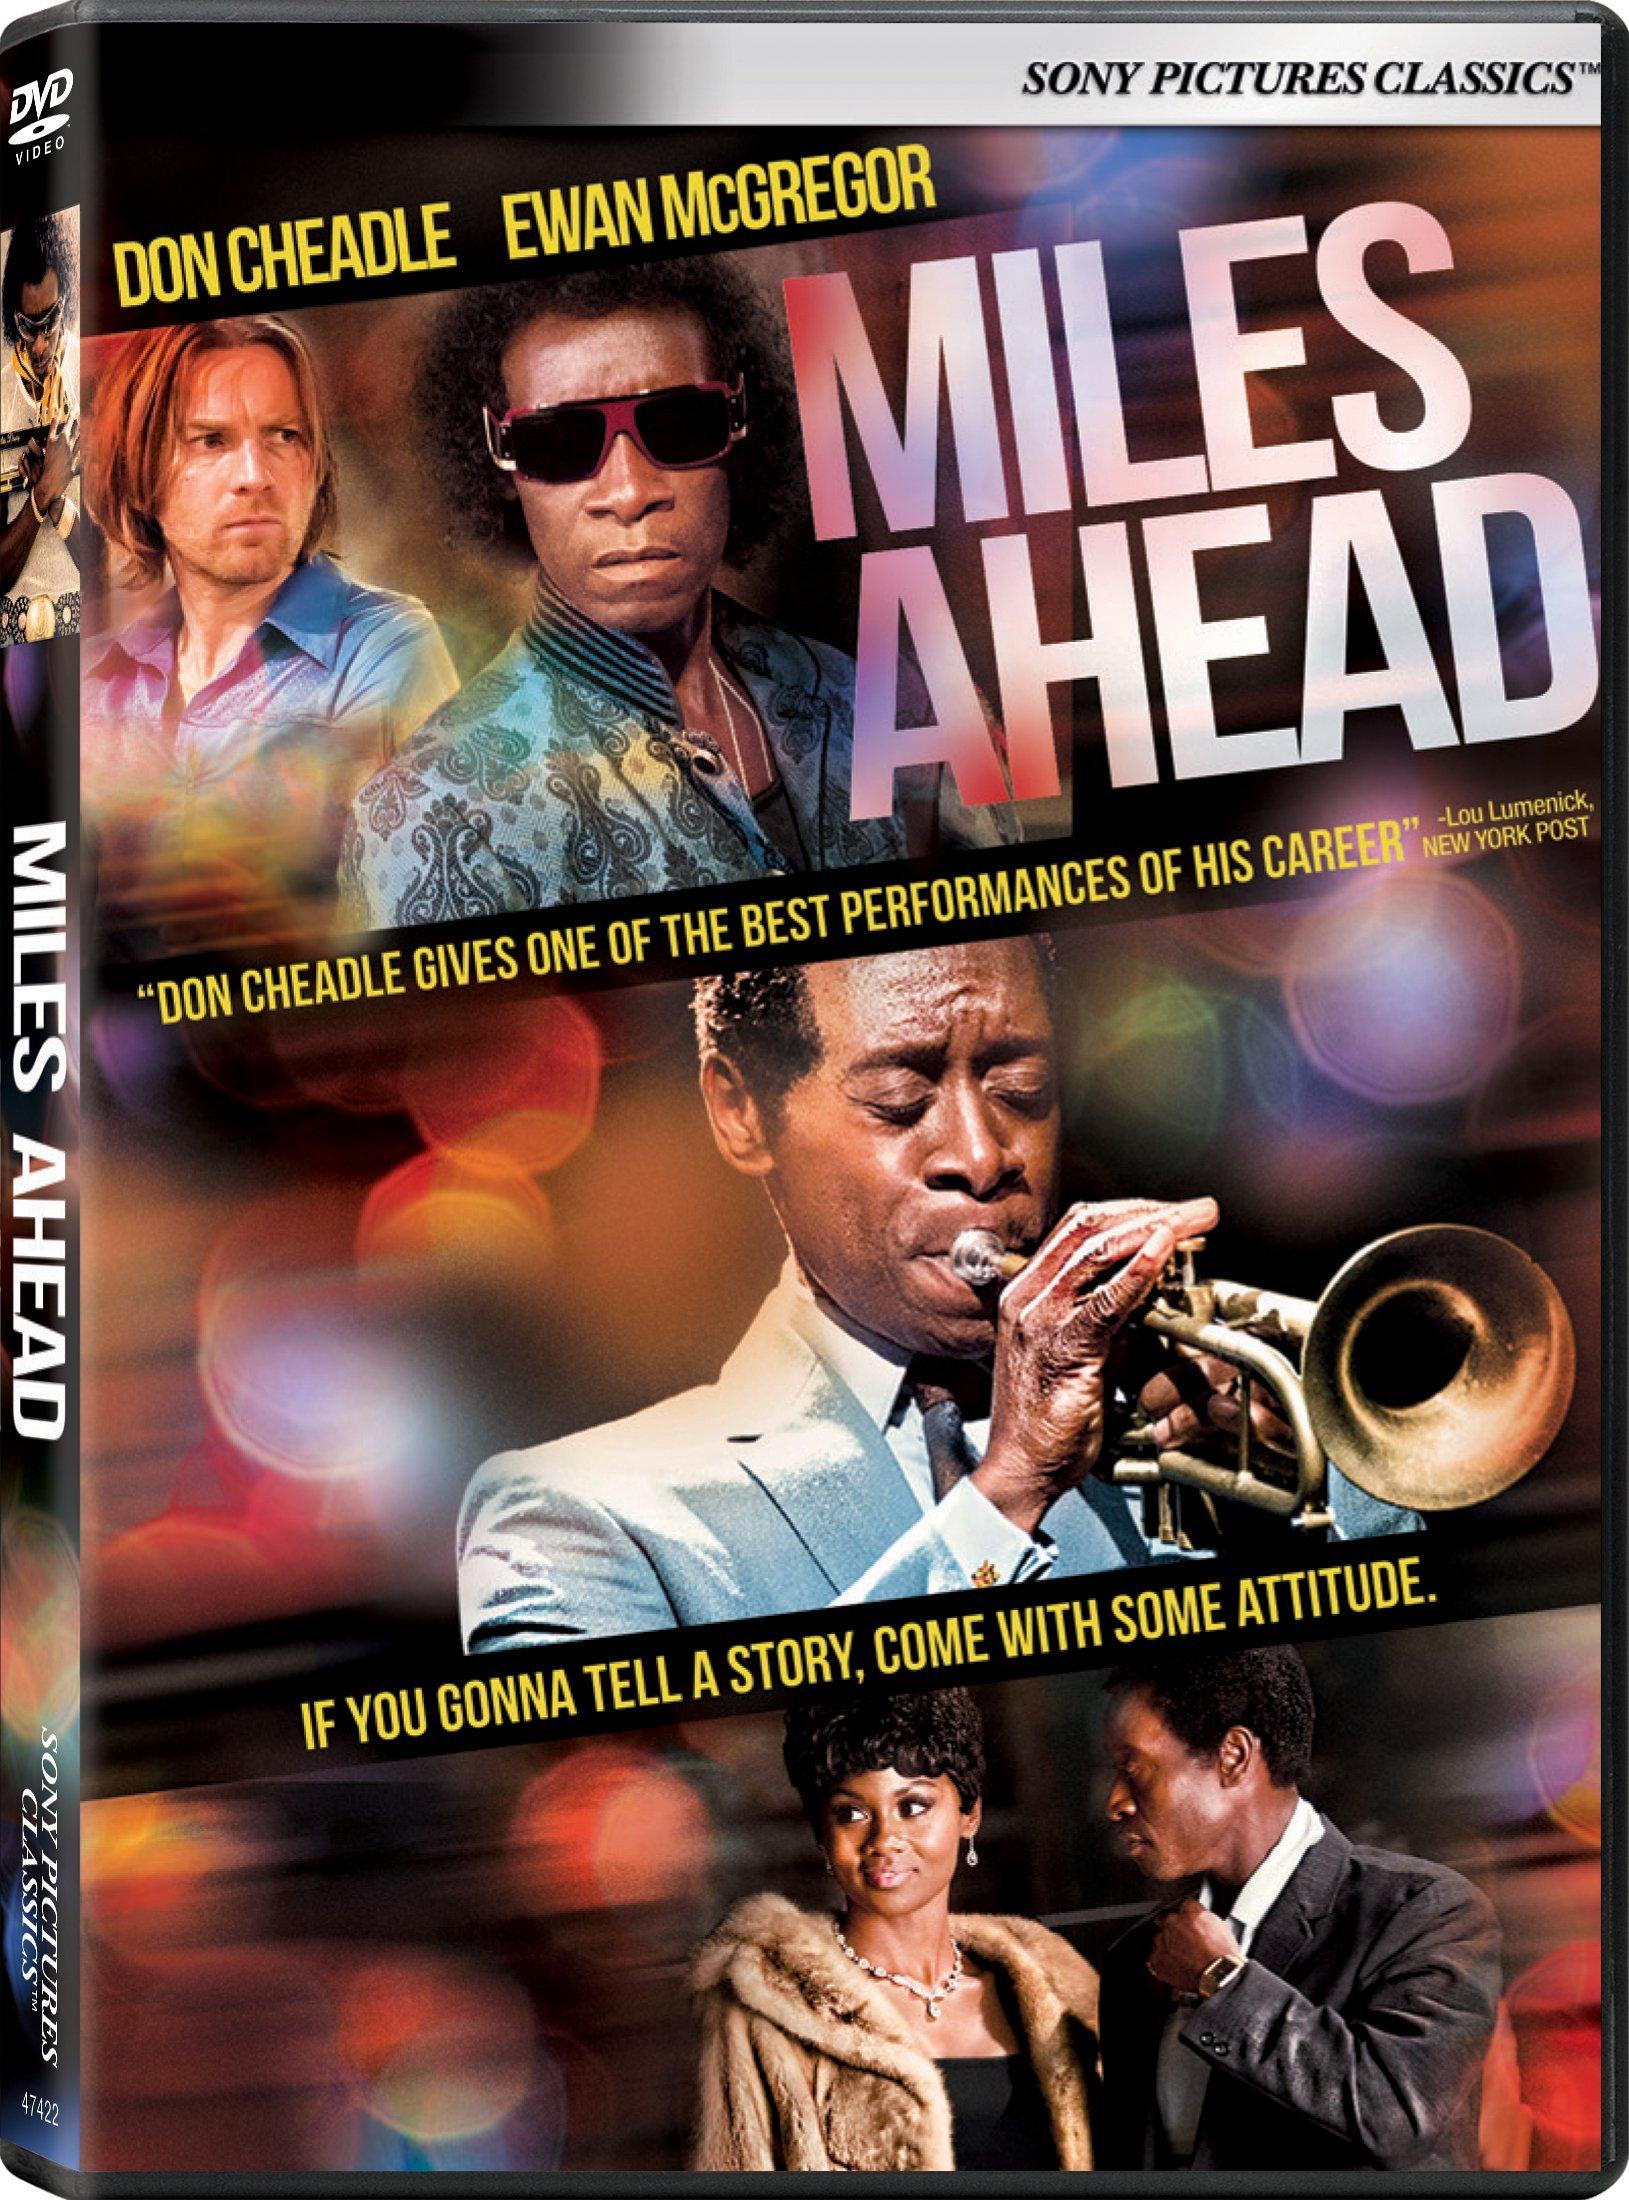 DVD : Don Cheadle - Miles Ahead (DVD)